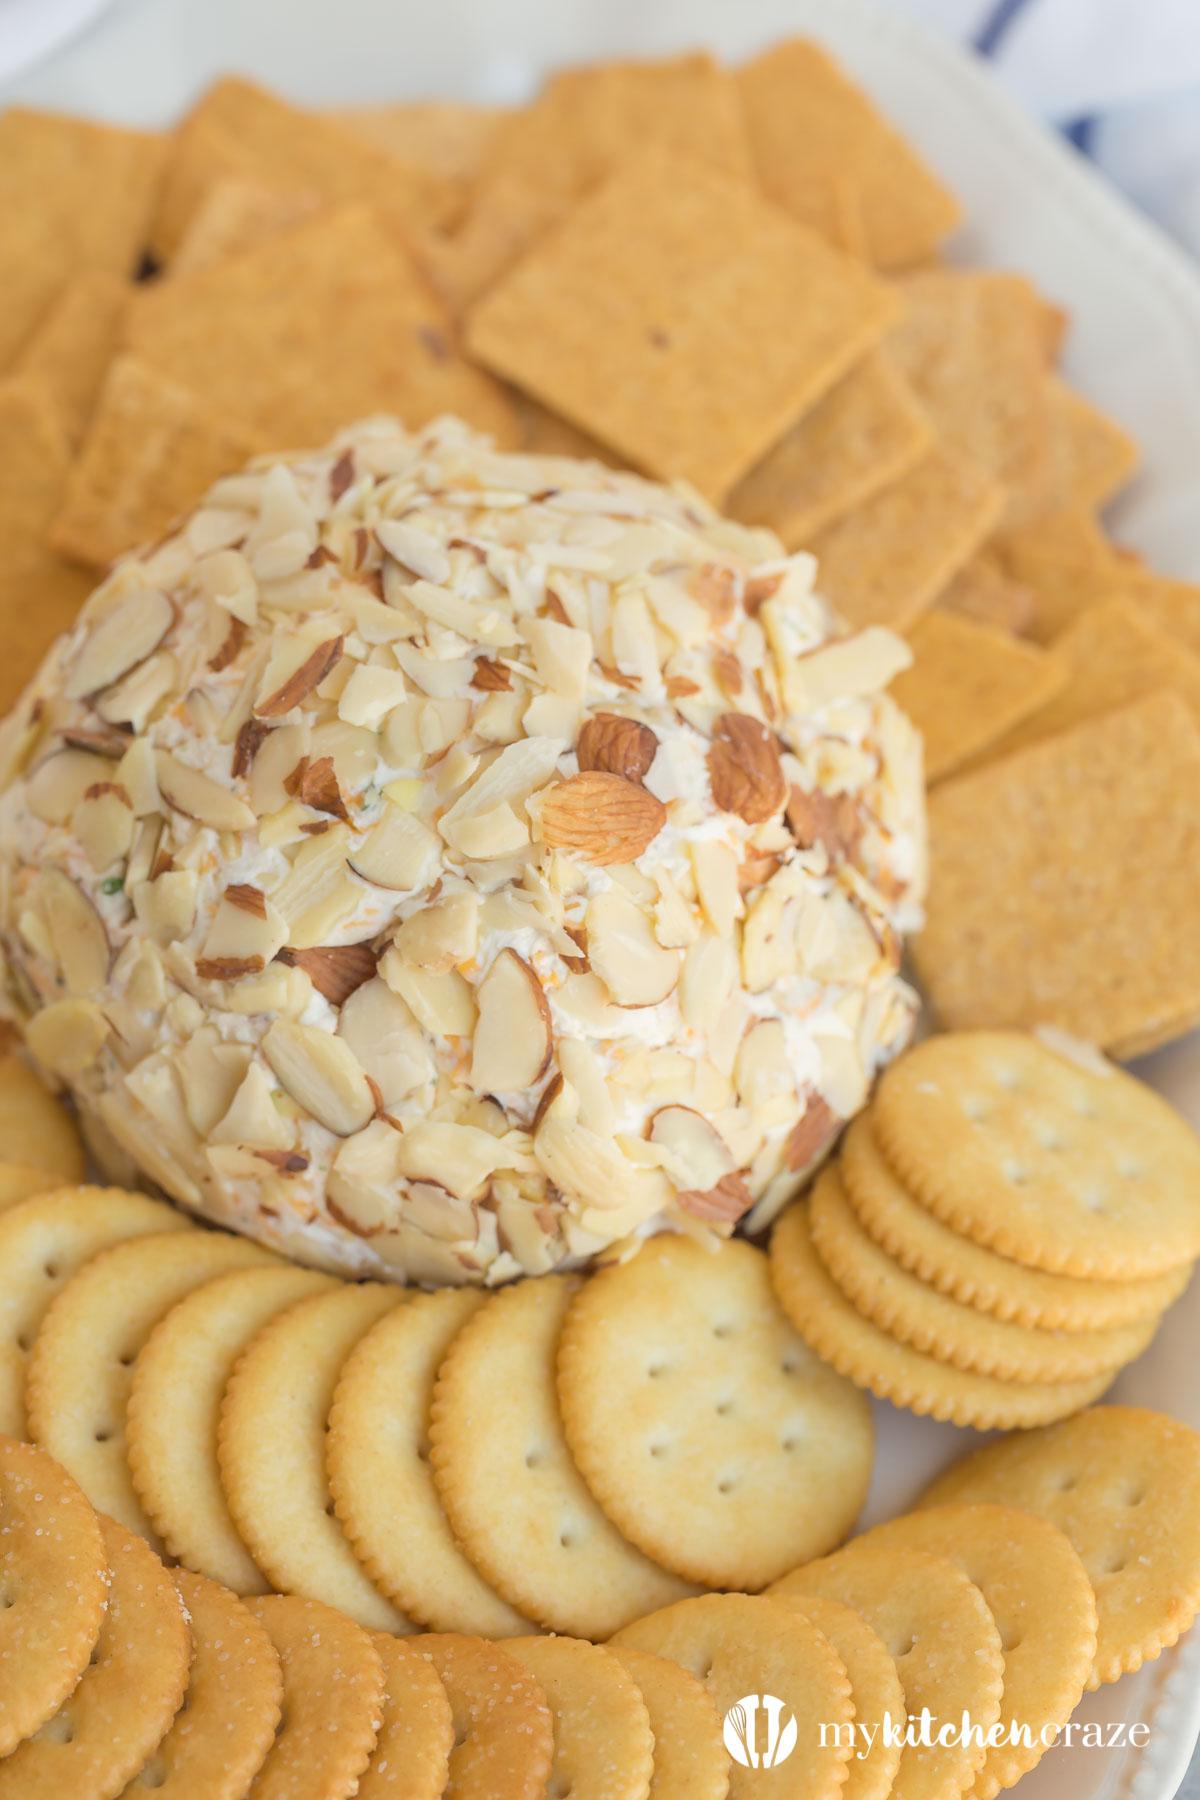 Homemade cheese ball recipe